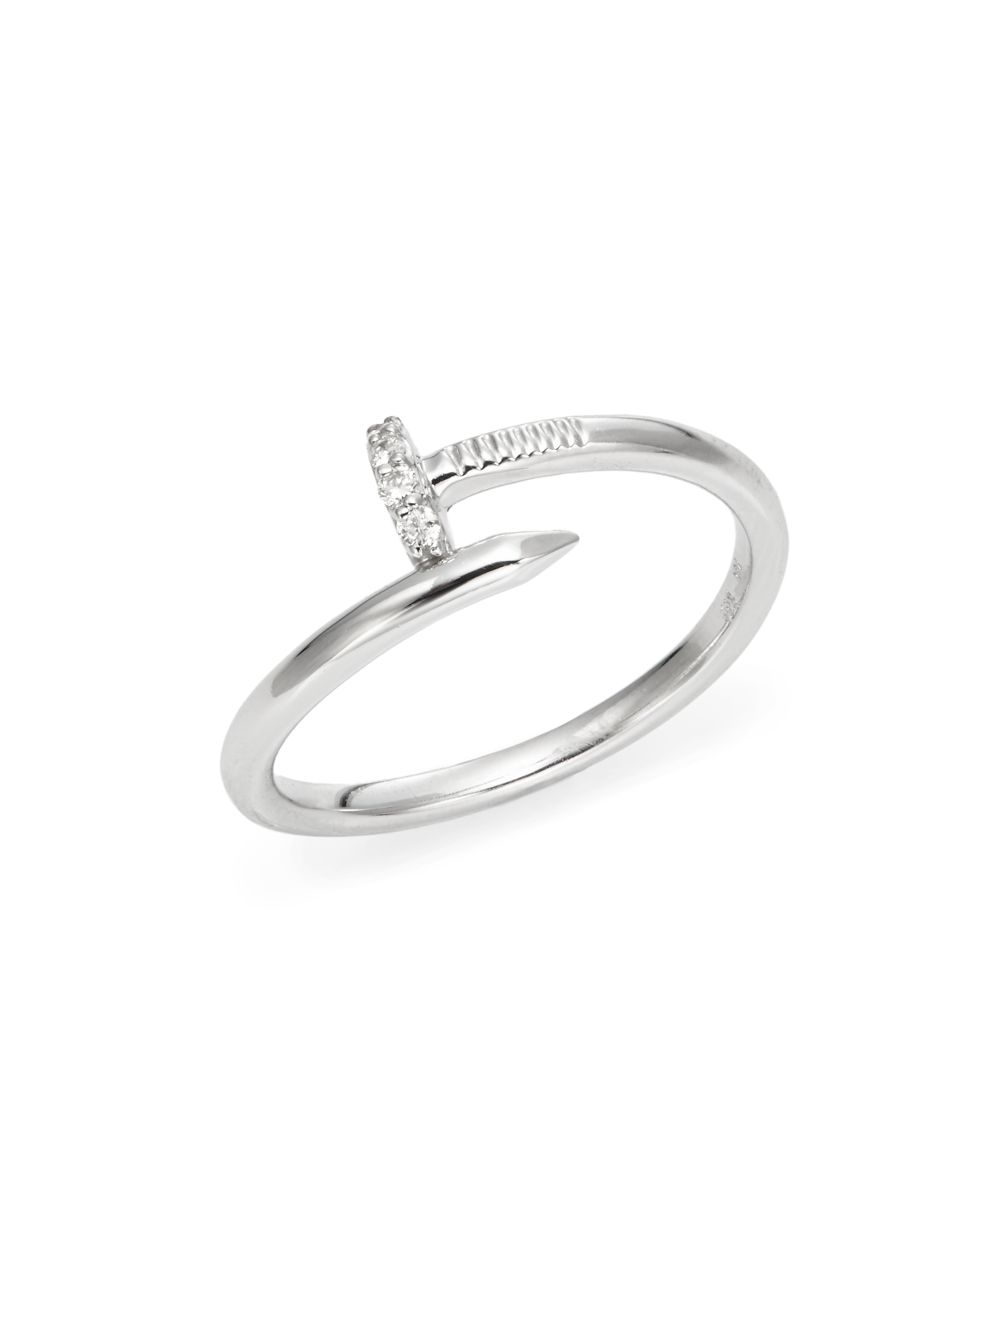 Lyst Kc Designs Brilliant Diamond 14k White Gold Nail Ring In White